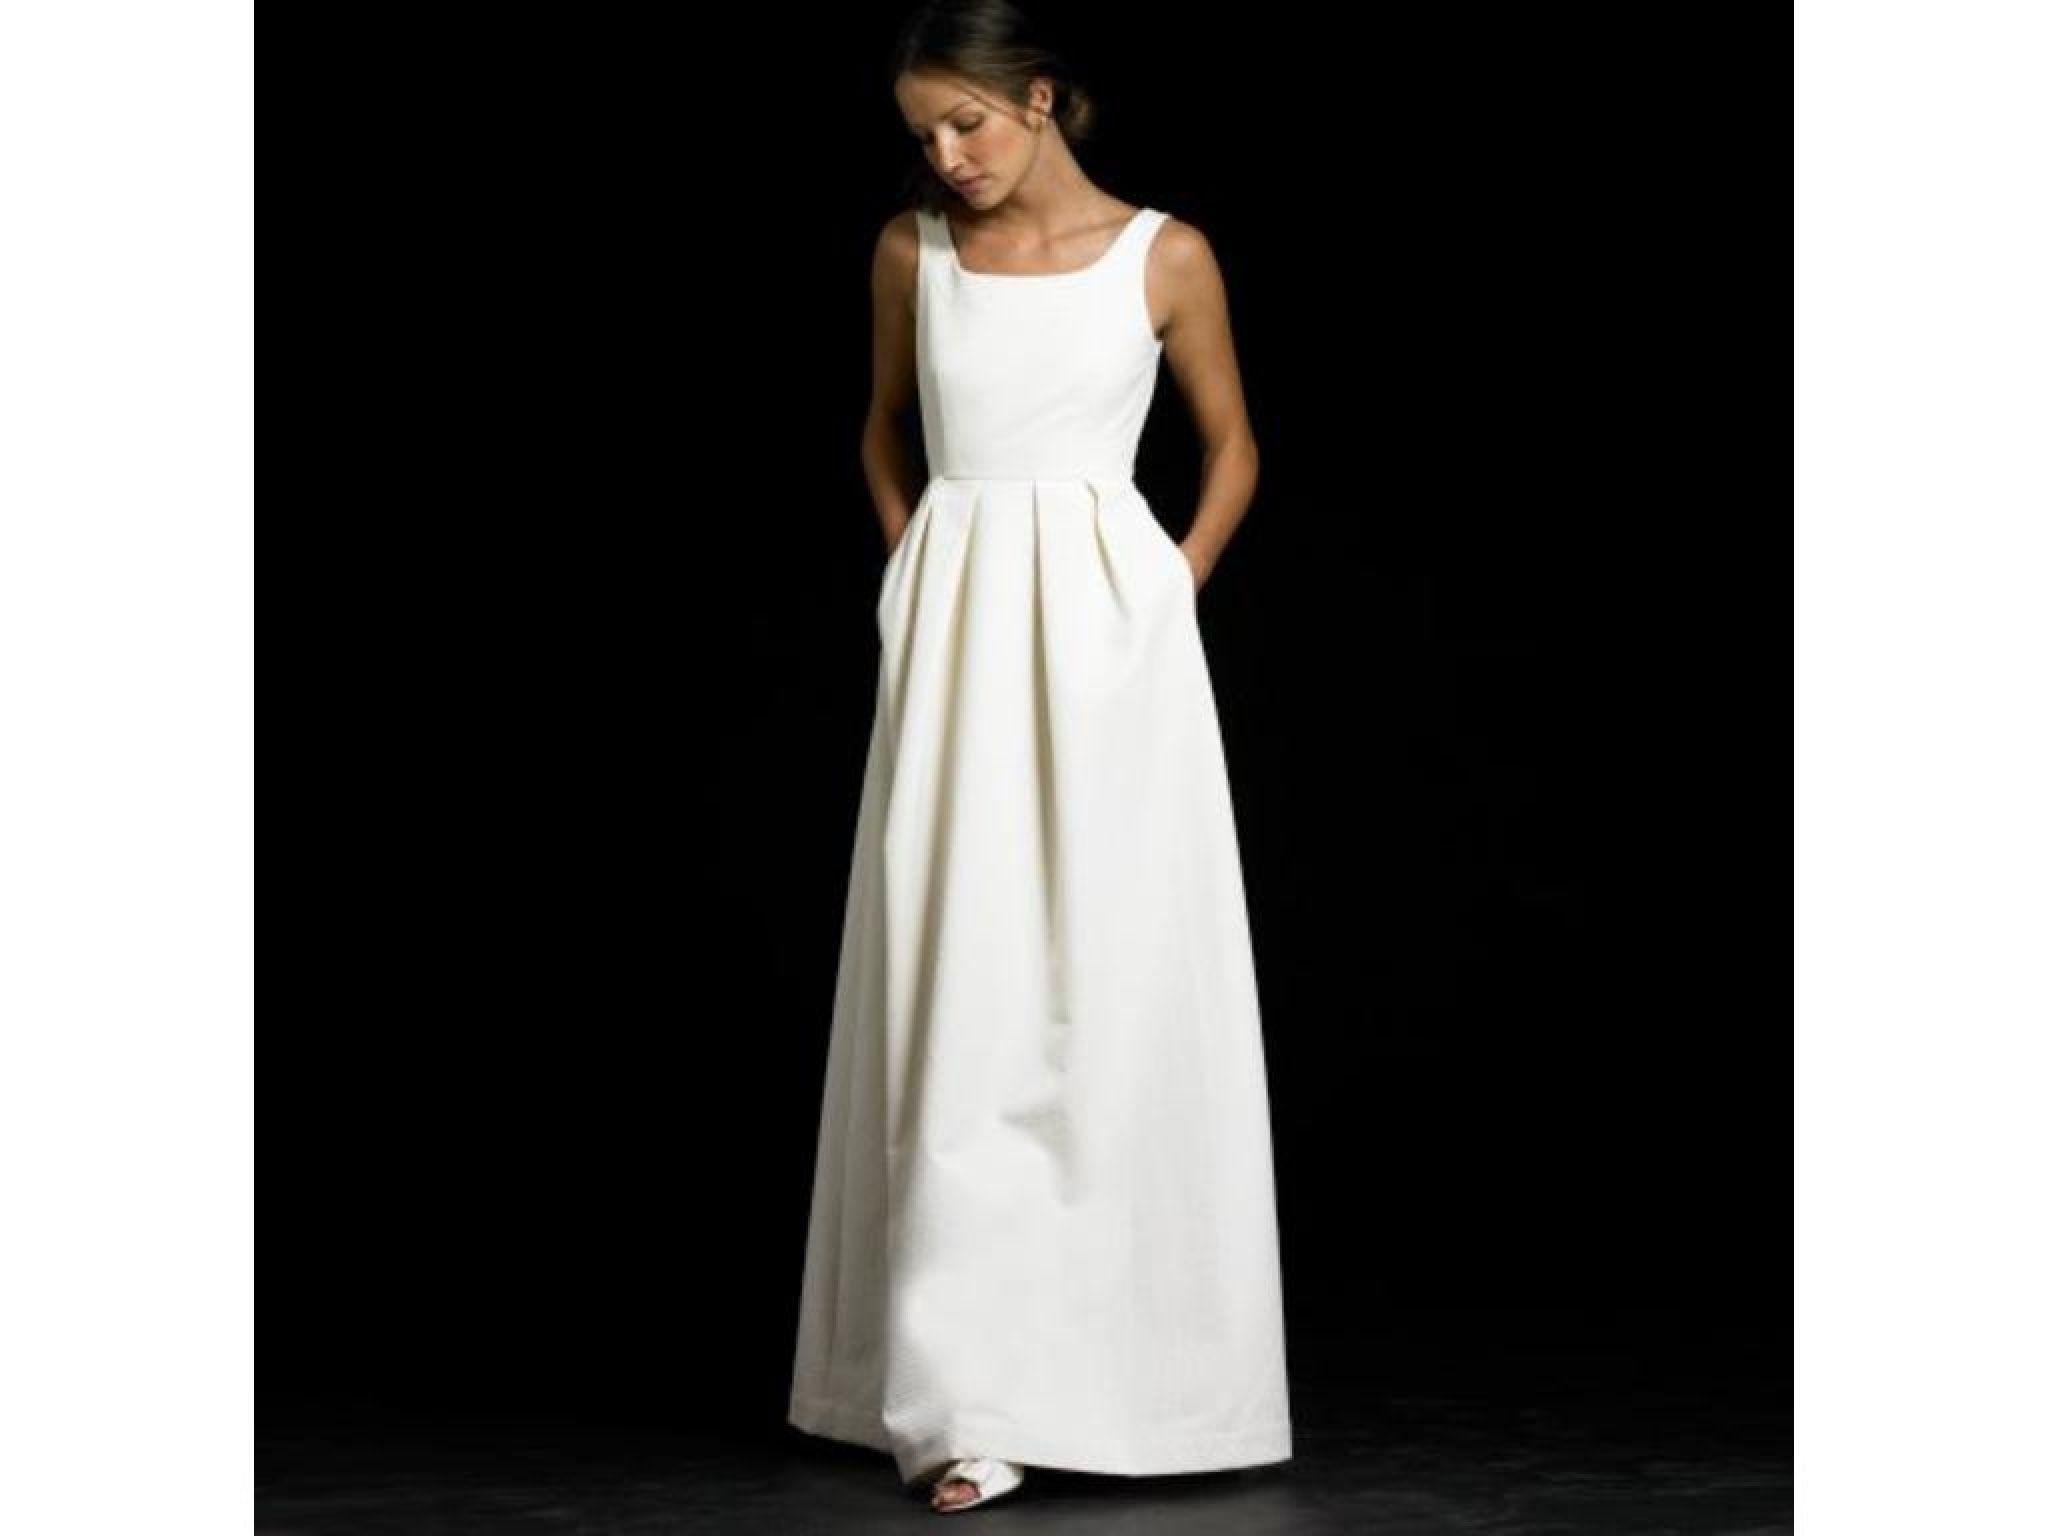 J crew short wedding dress dresses for wedding reception check j crew short wedding dress dresses for wedding reception check more at http ombrellifo Choice Image